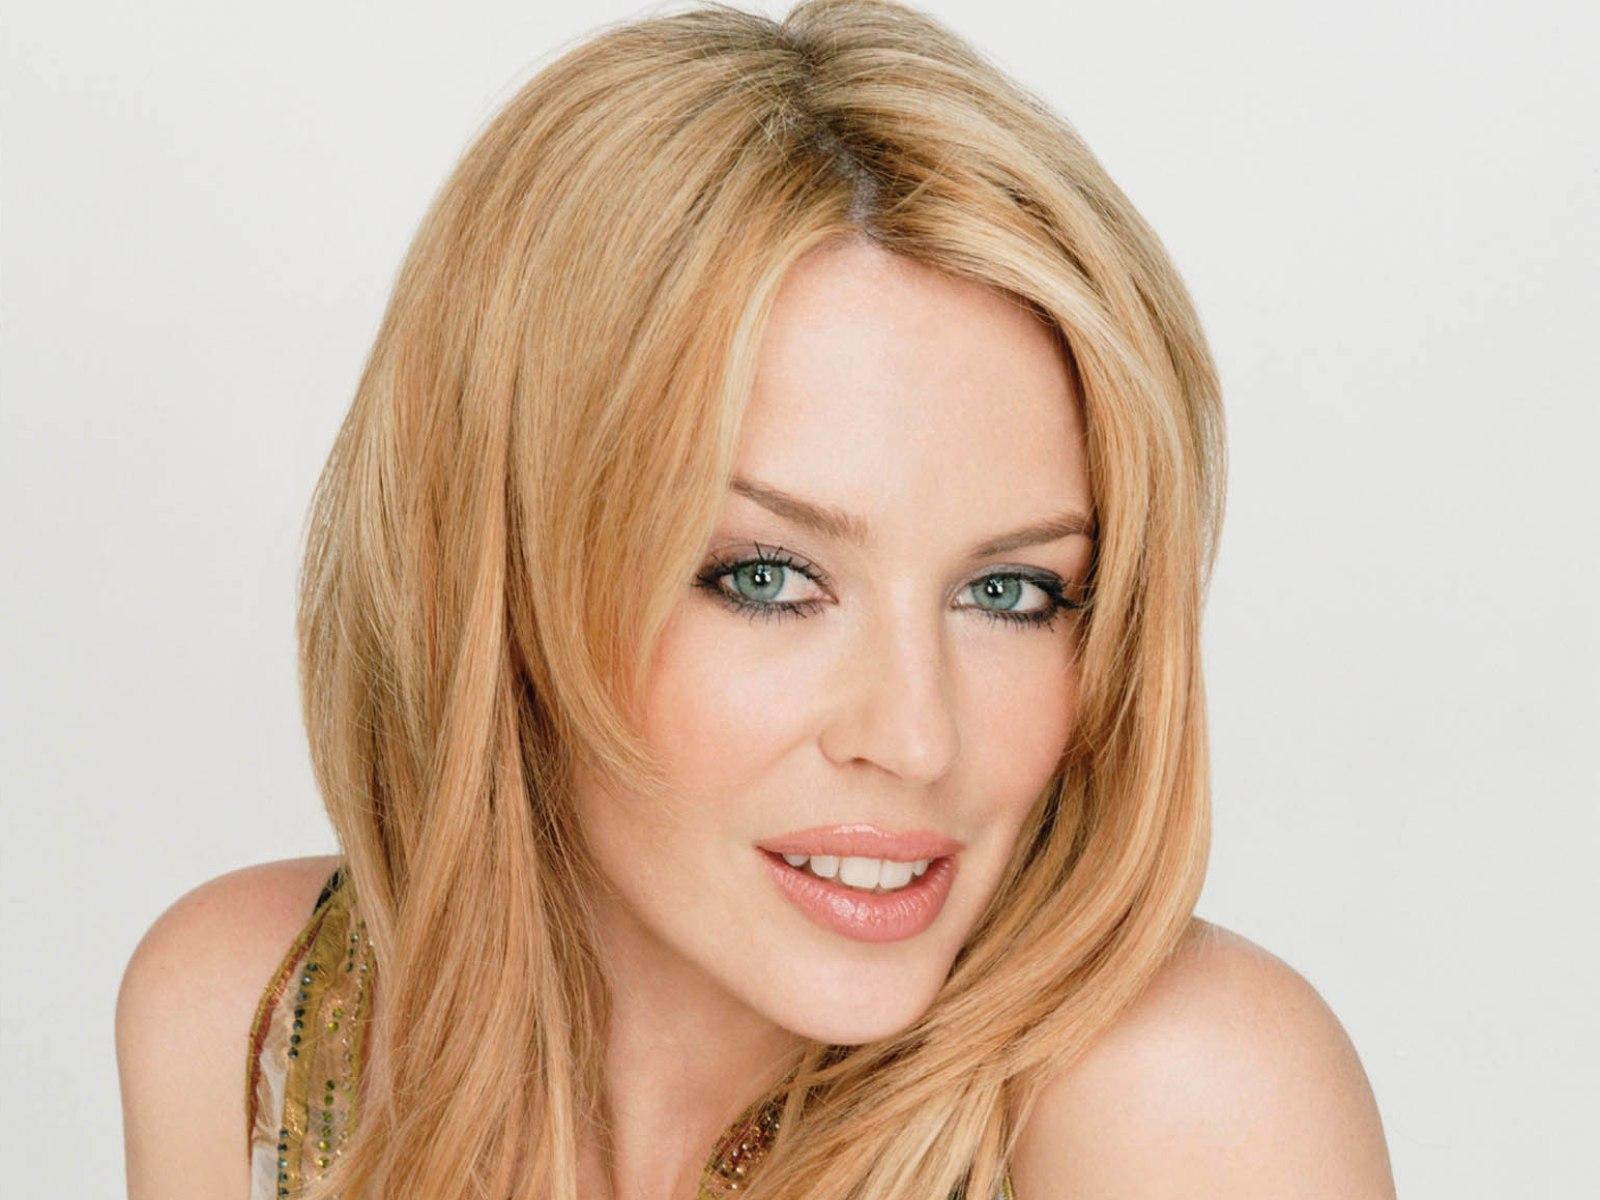 http://4.bp.blogspot.com/-4Dn7c2jsv0U/USlb3zqe68I/AAAAAAAAlaU/p14P5tDBoxU/s1600/Kylie-Minogue.jpg